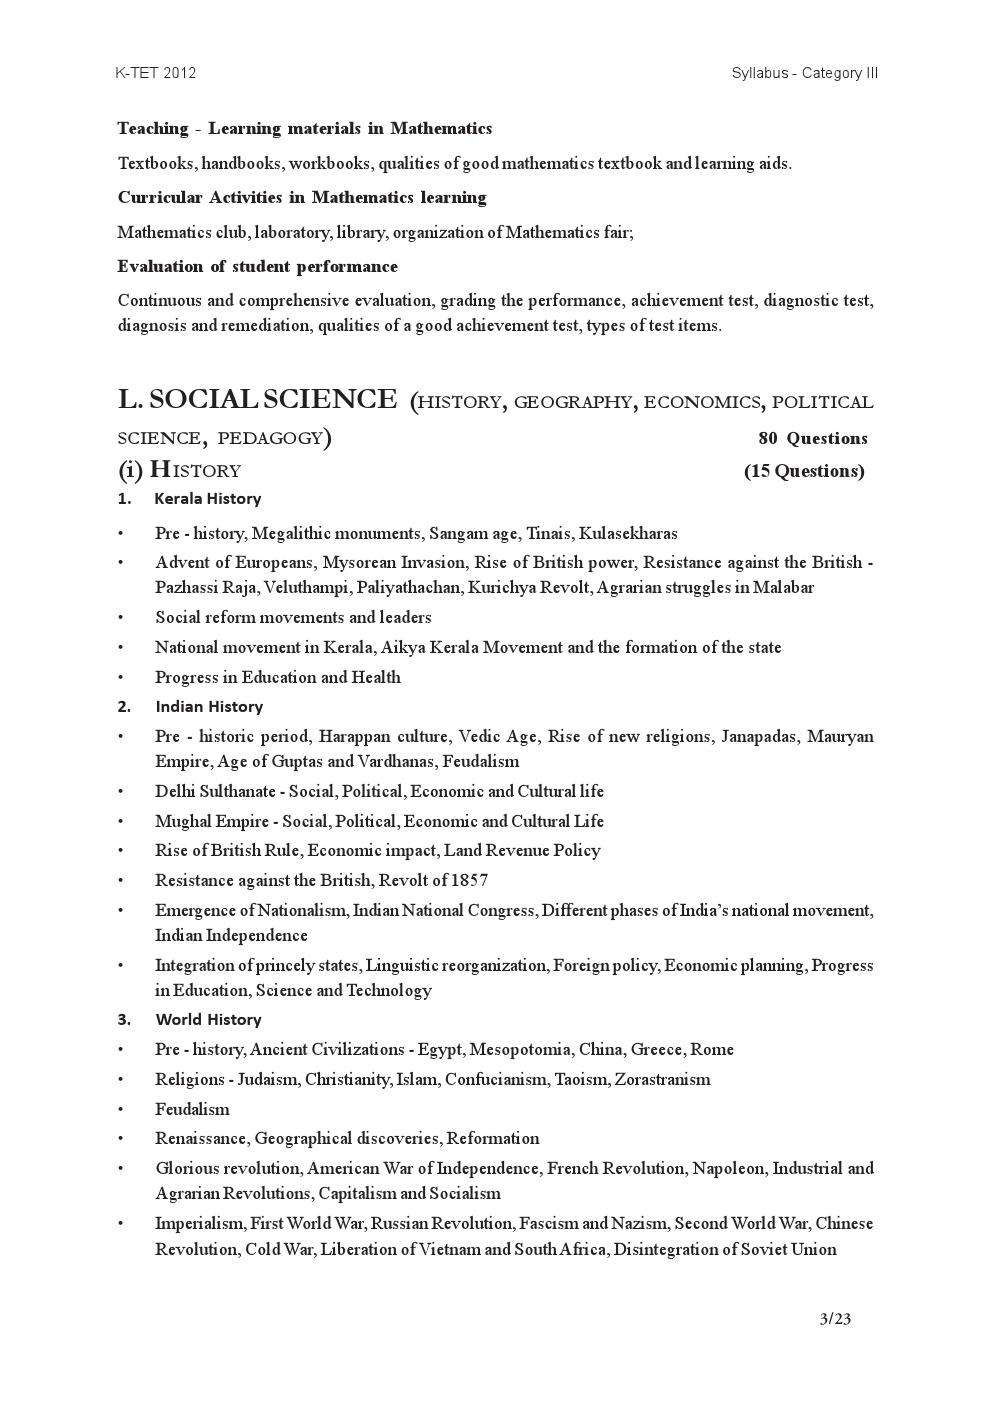 http://masterstudy.net/pdf/syllabus30023.jpg